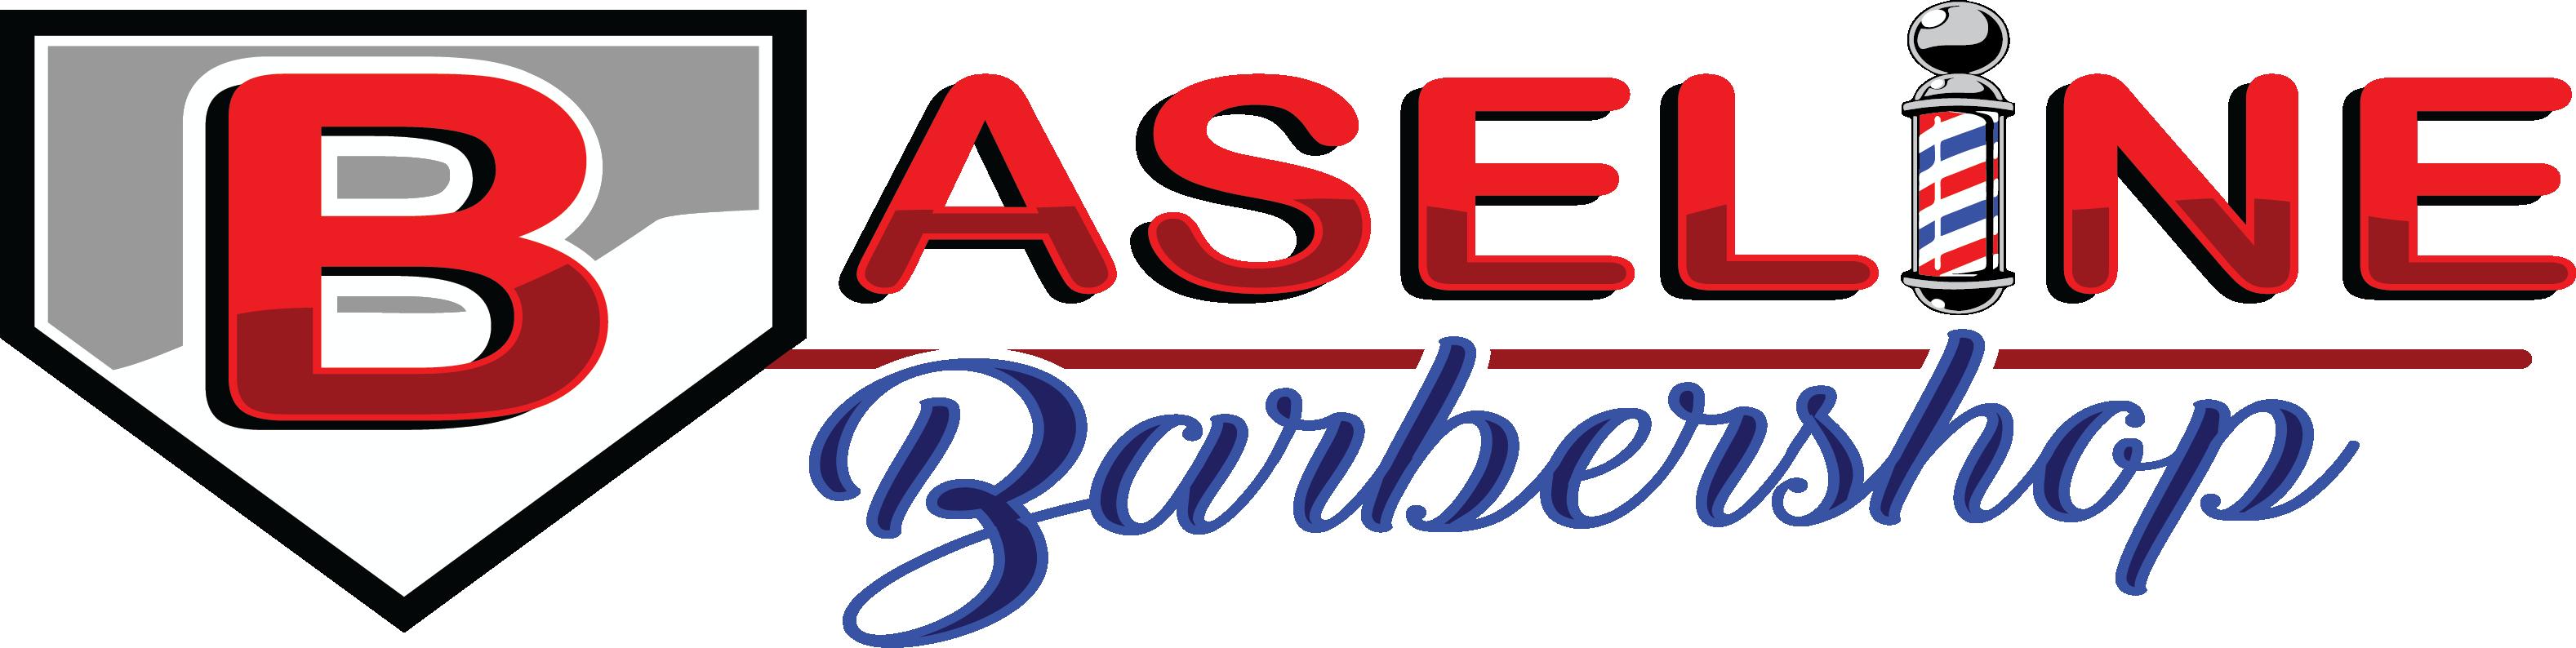 Baseline Barbershop